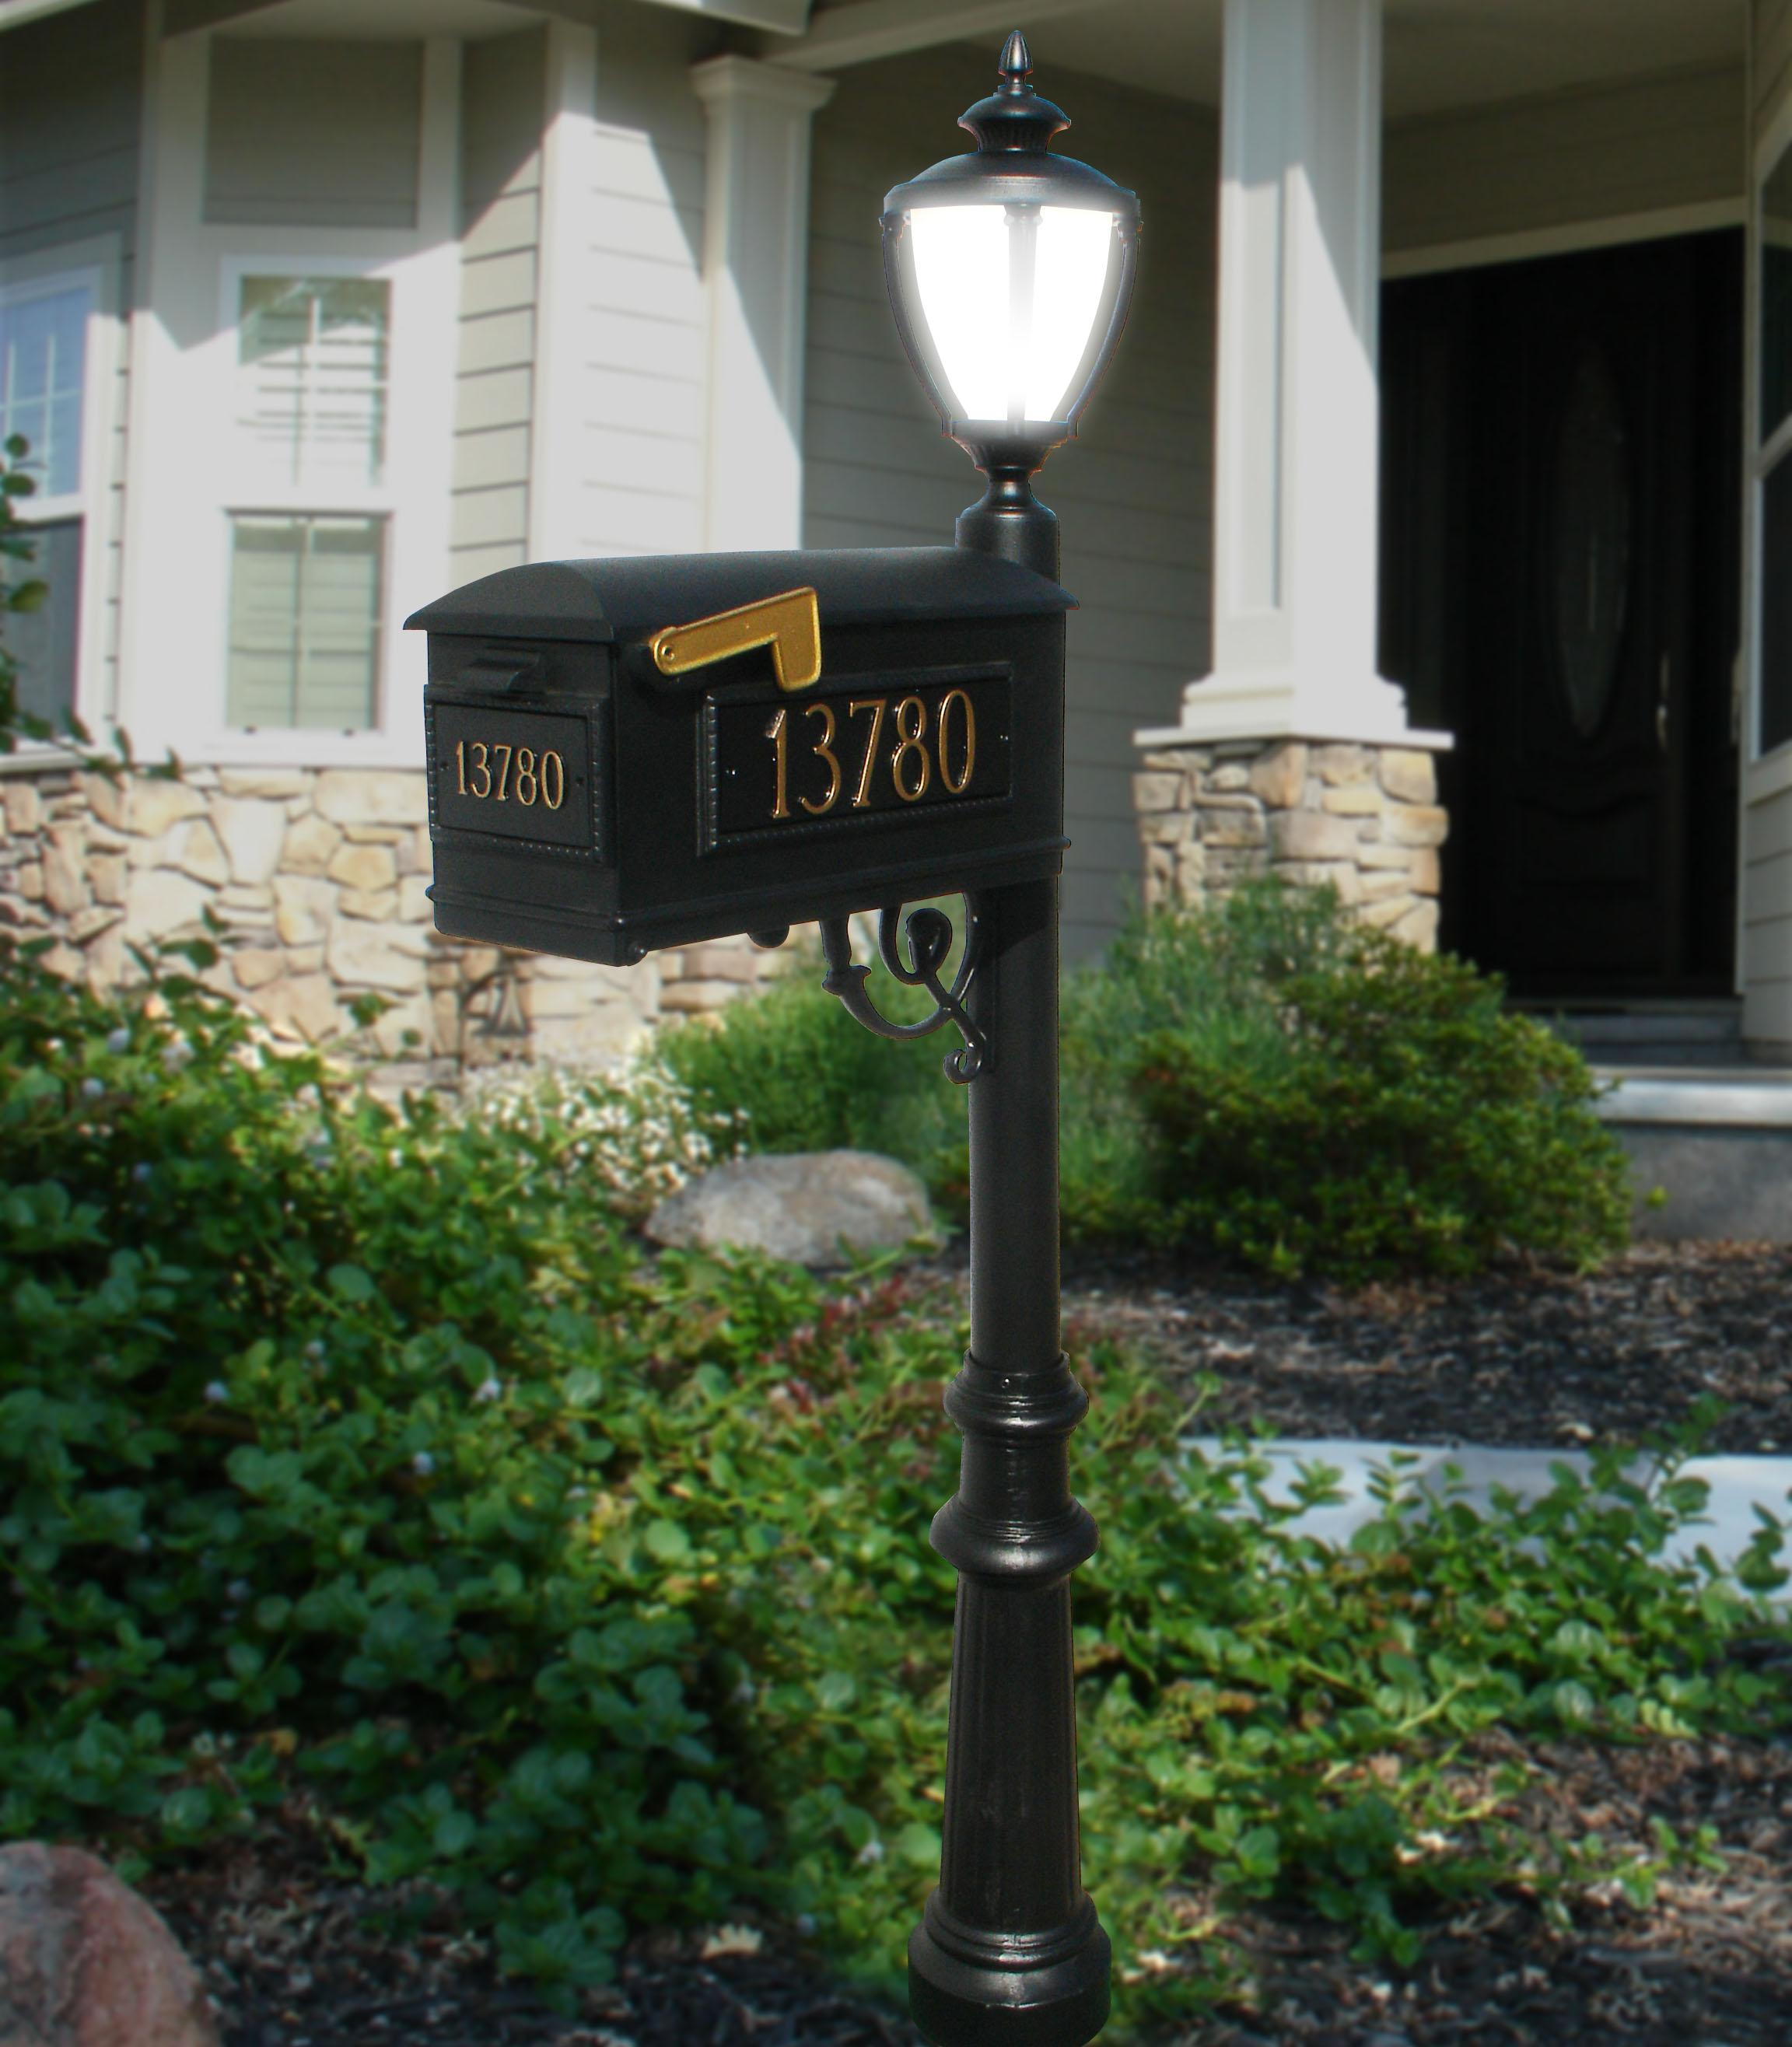 Qualarc Decorative Mailboxes and Posts